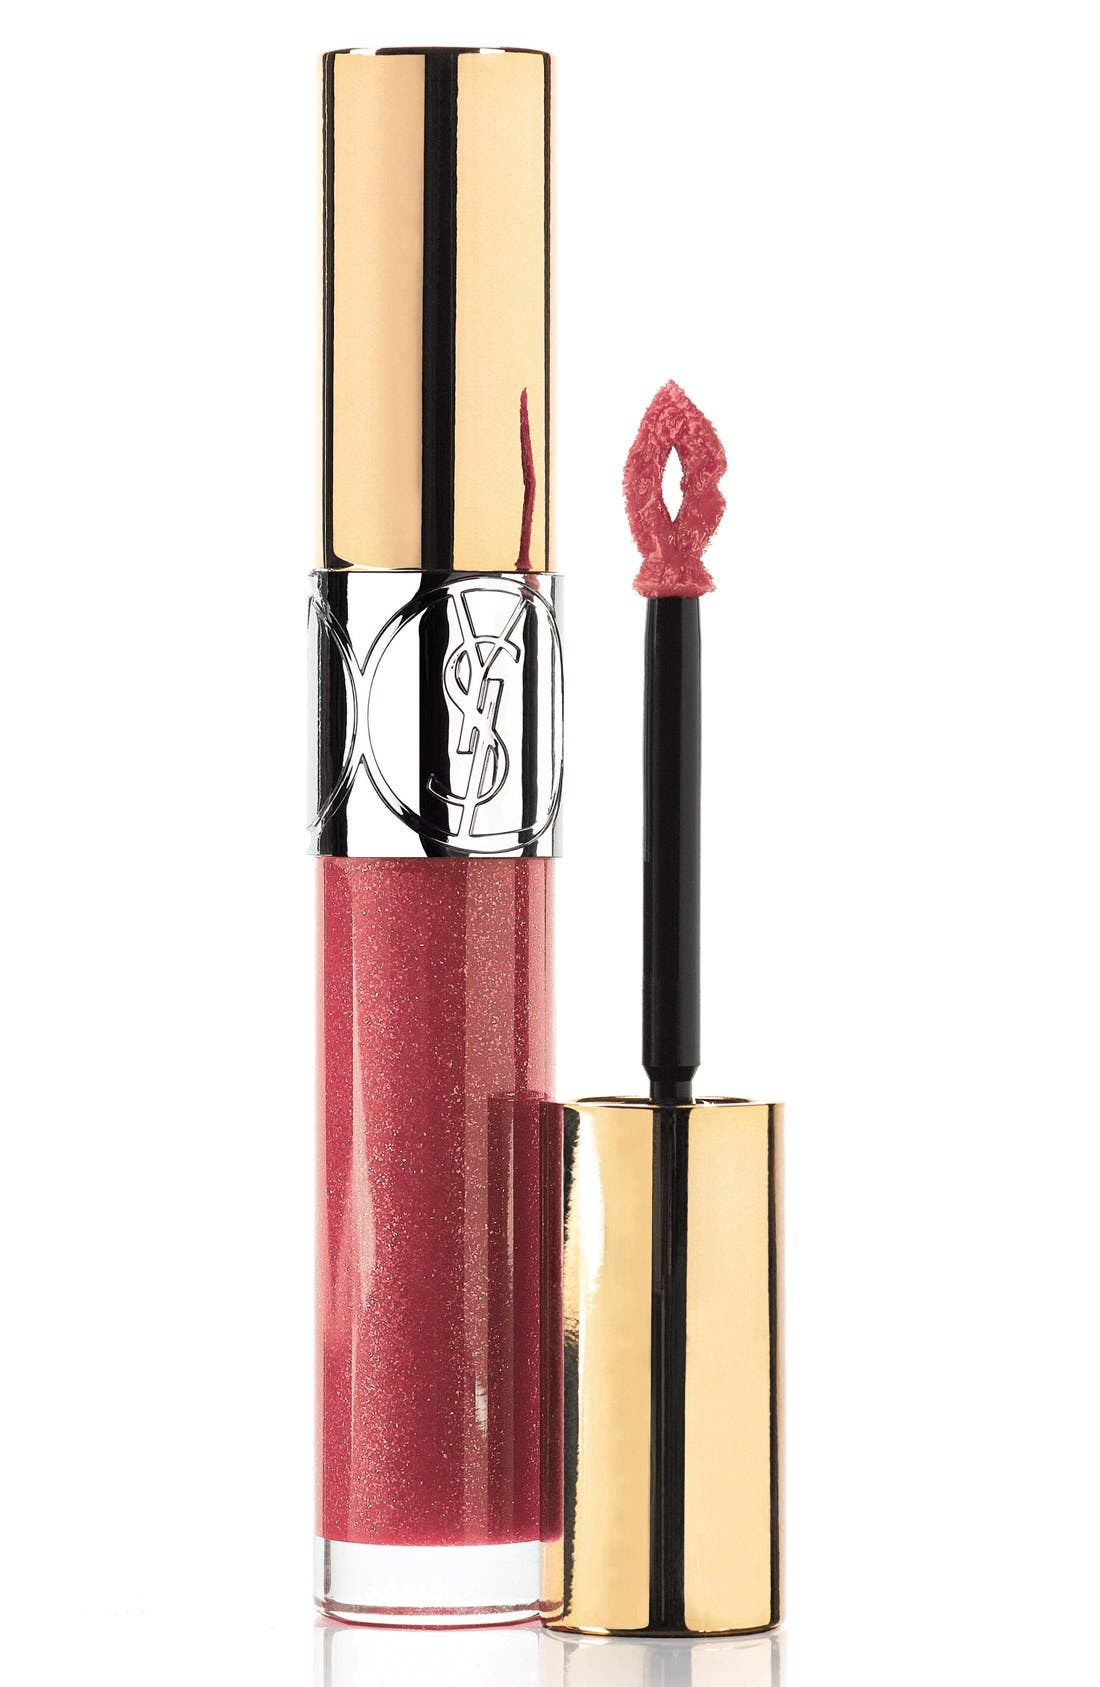 'Savage Summer - Gloss Volupte' Lip Gloss,                             Main thumbnail 1, color,                             930